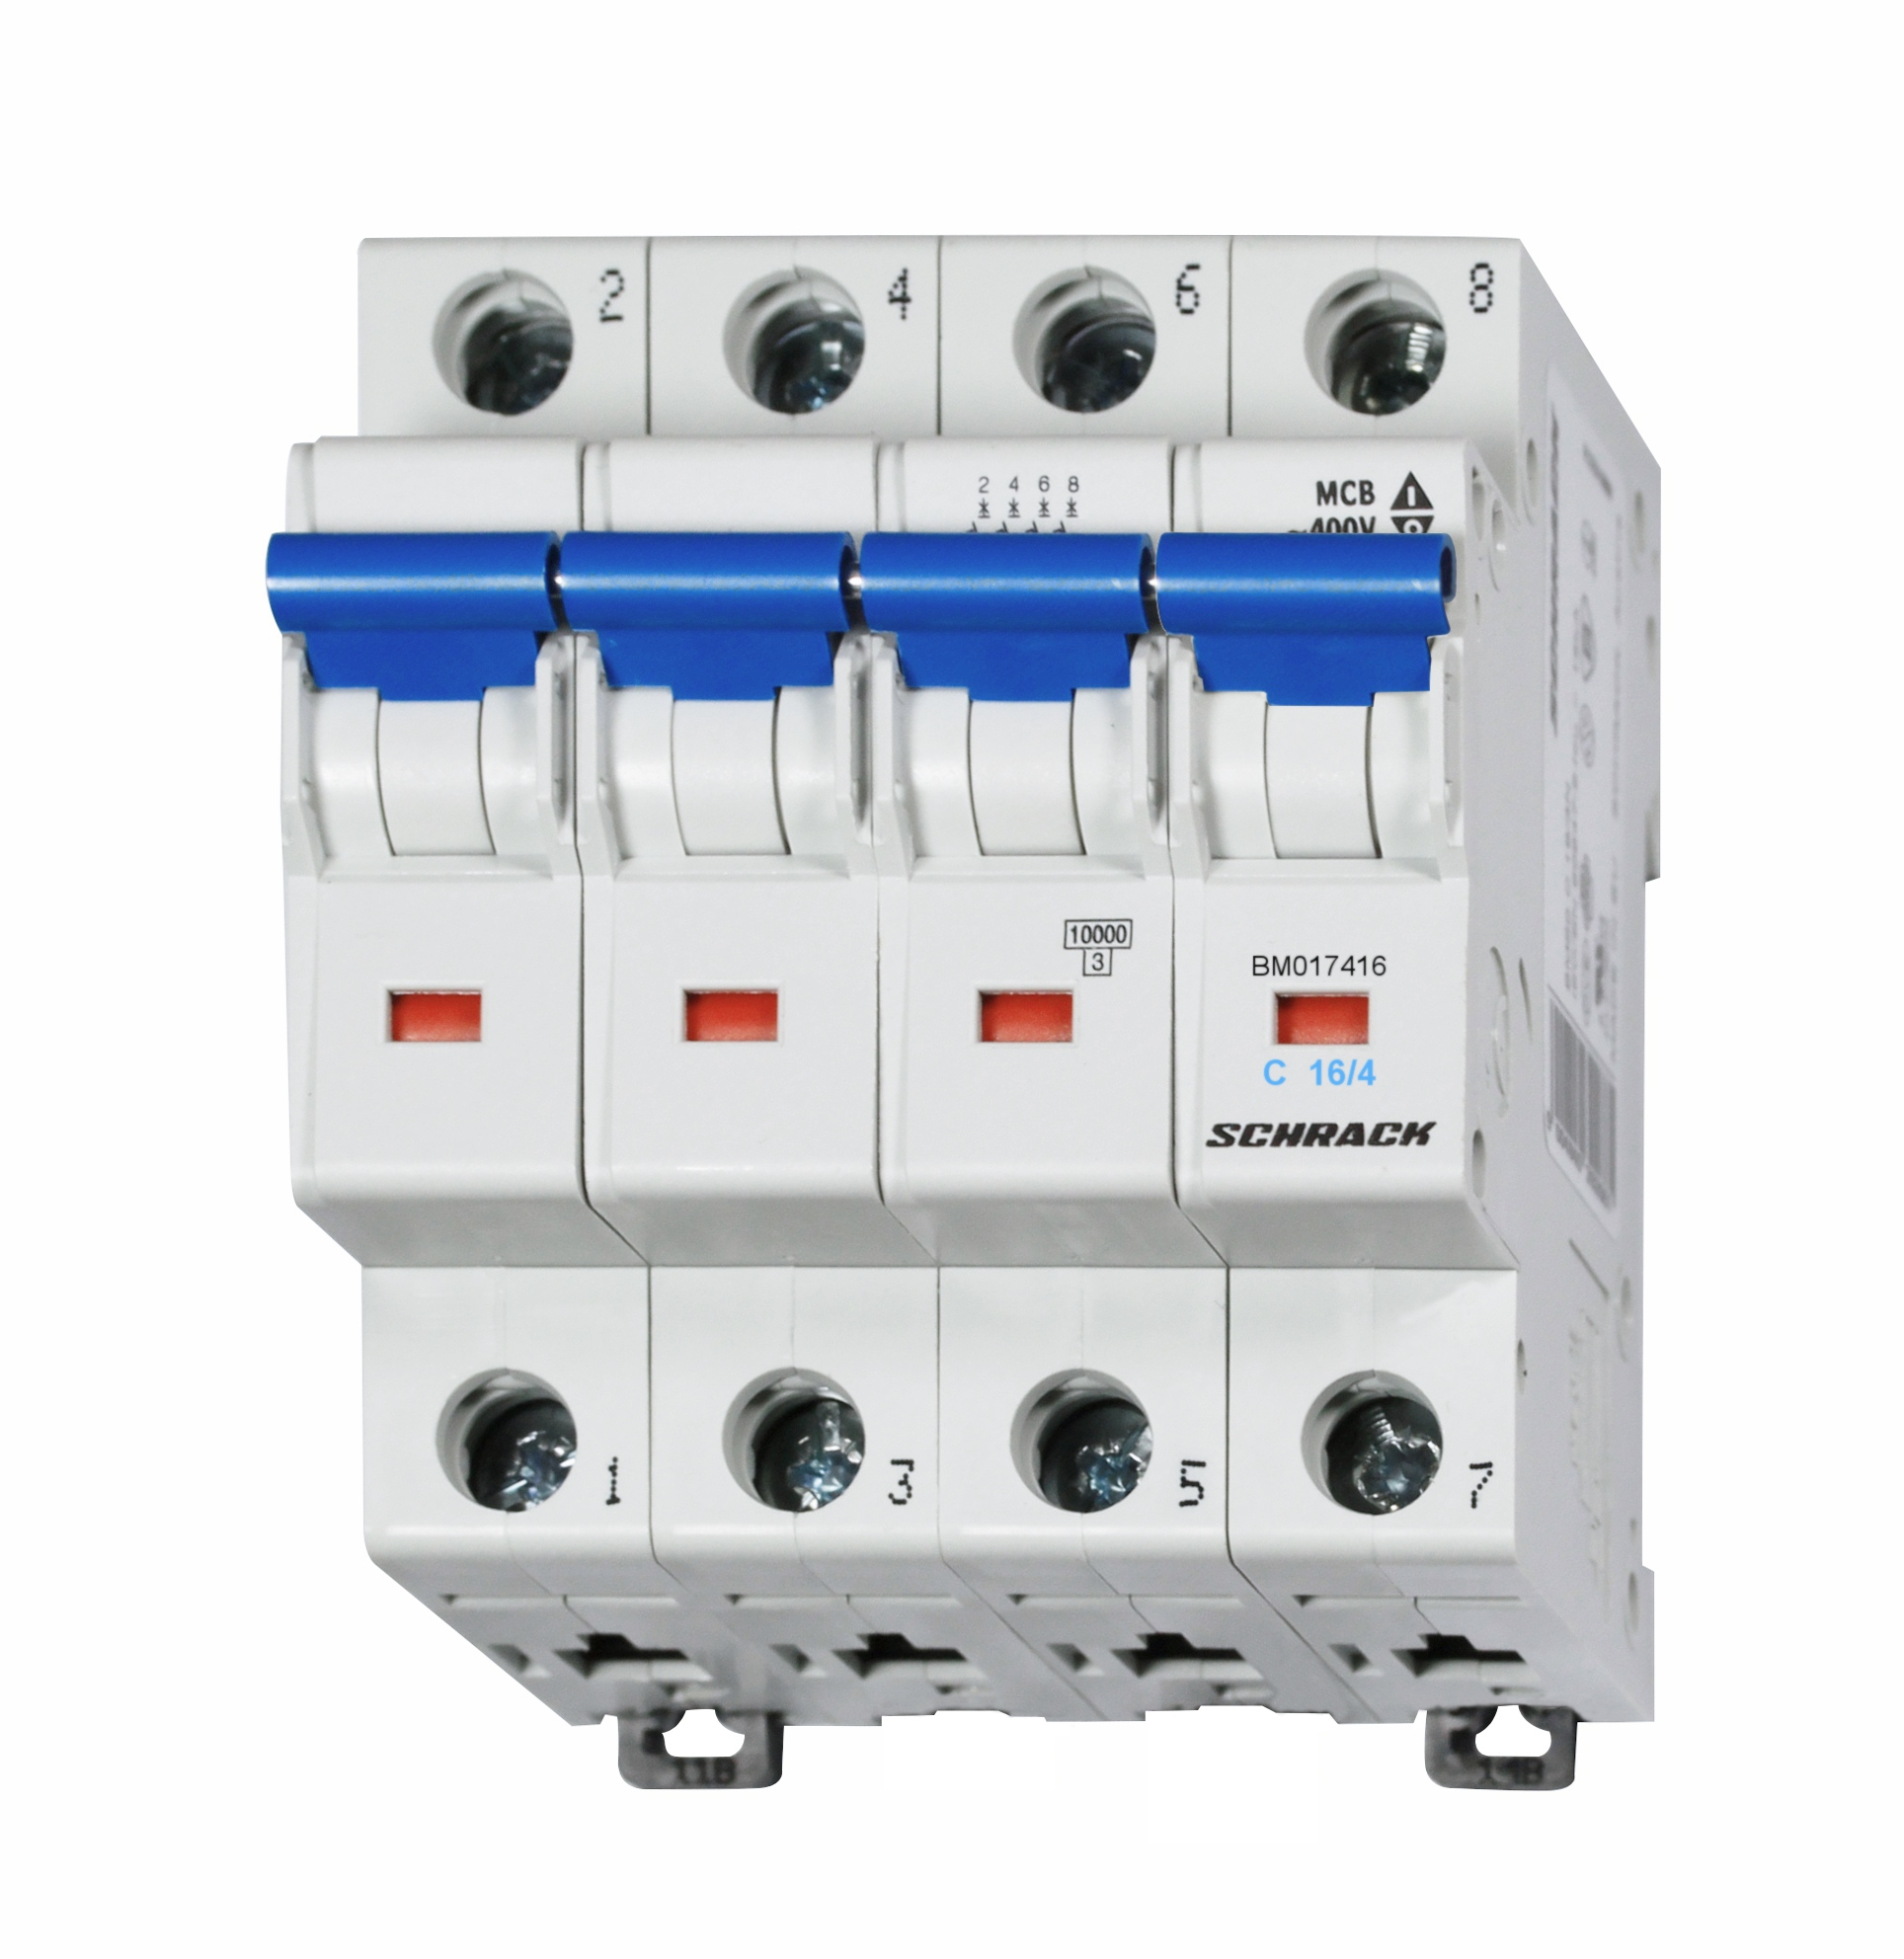 BM017416 - Schrack Technik